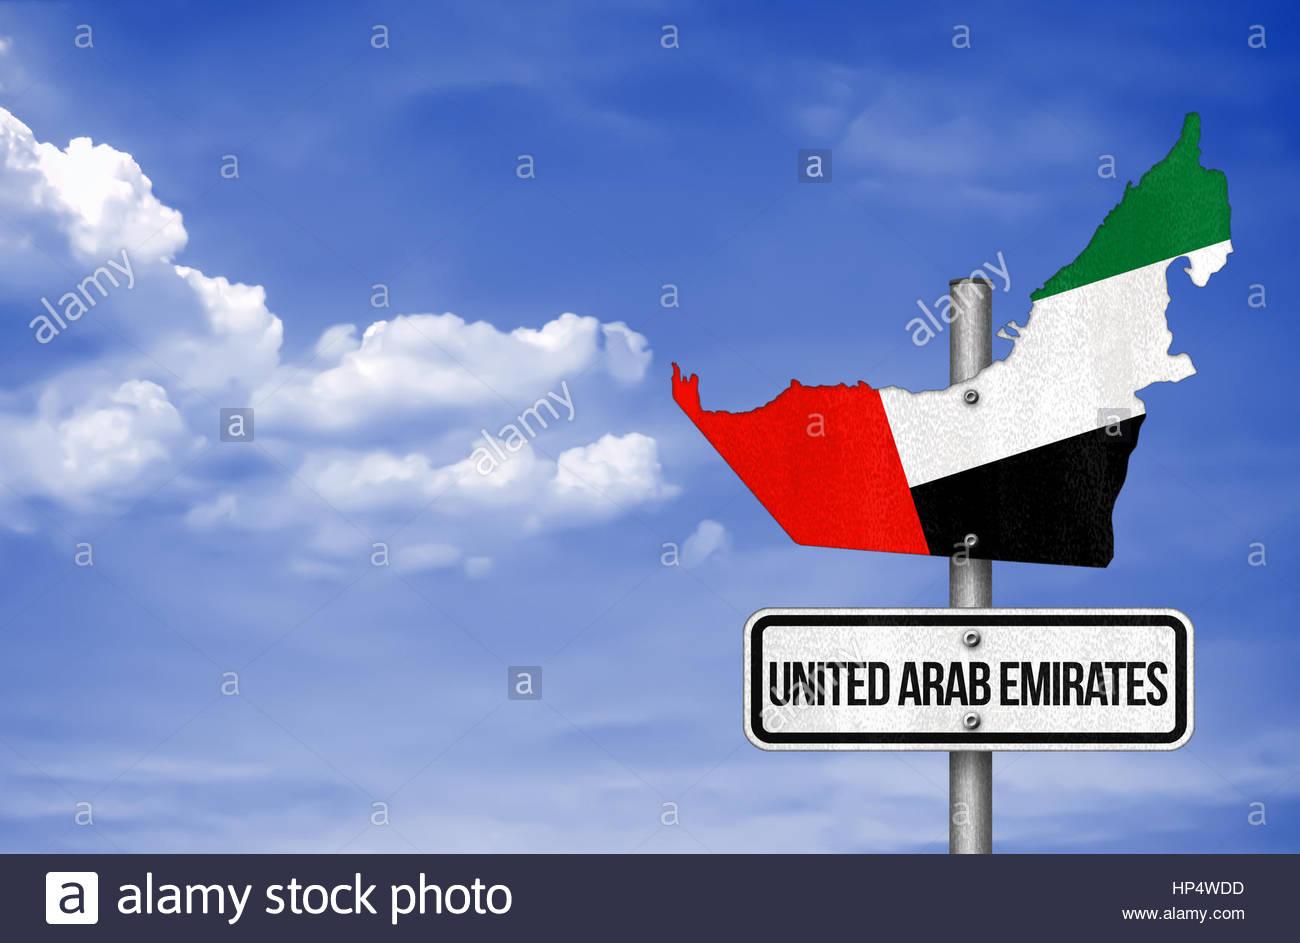 United Arab Emirates - road sign map Stock Photo